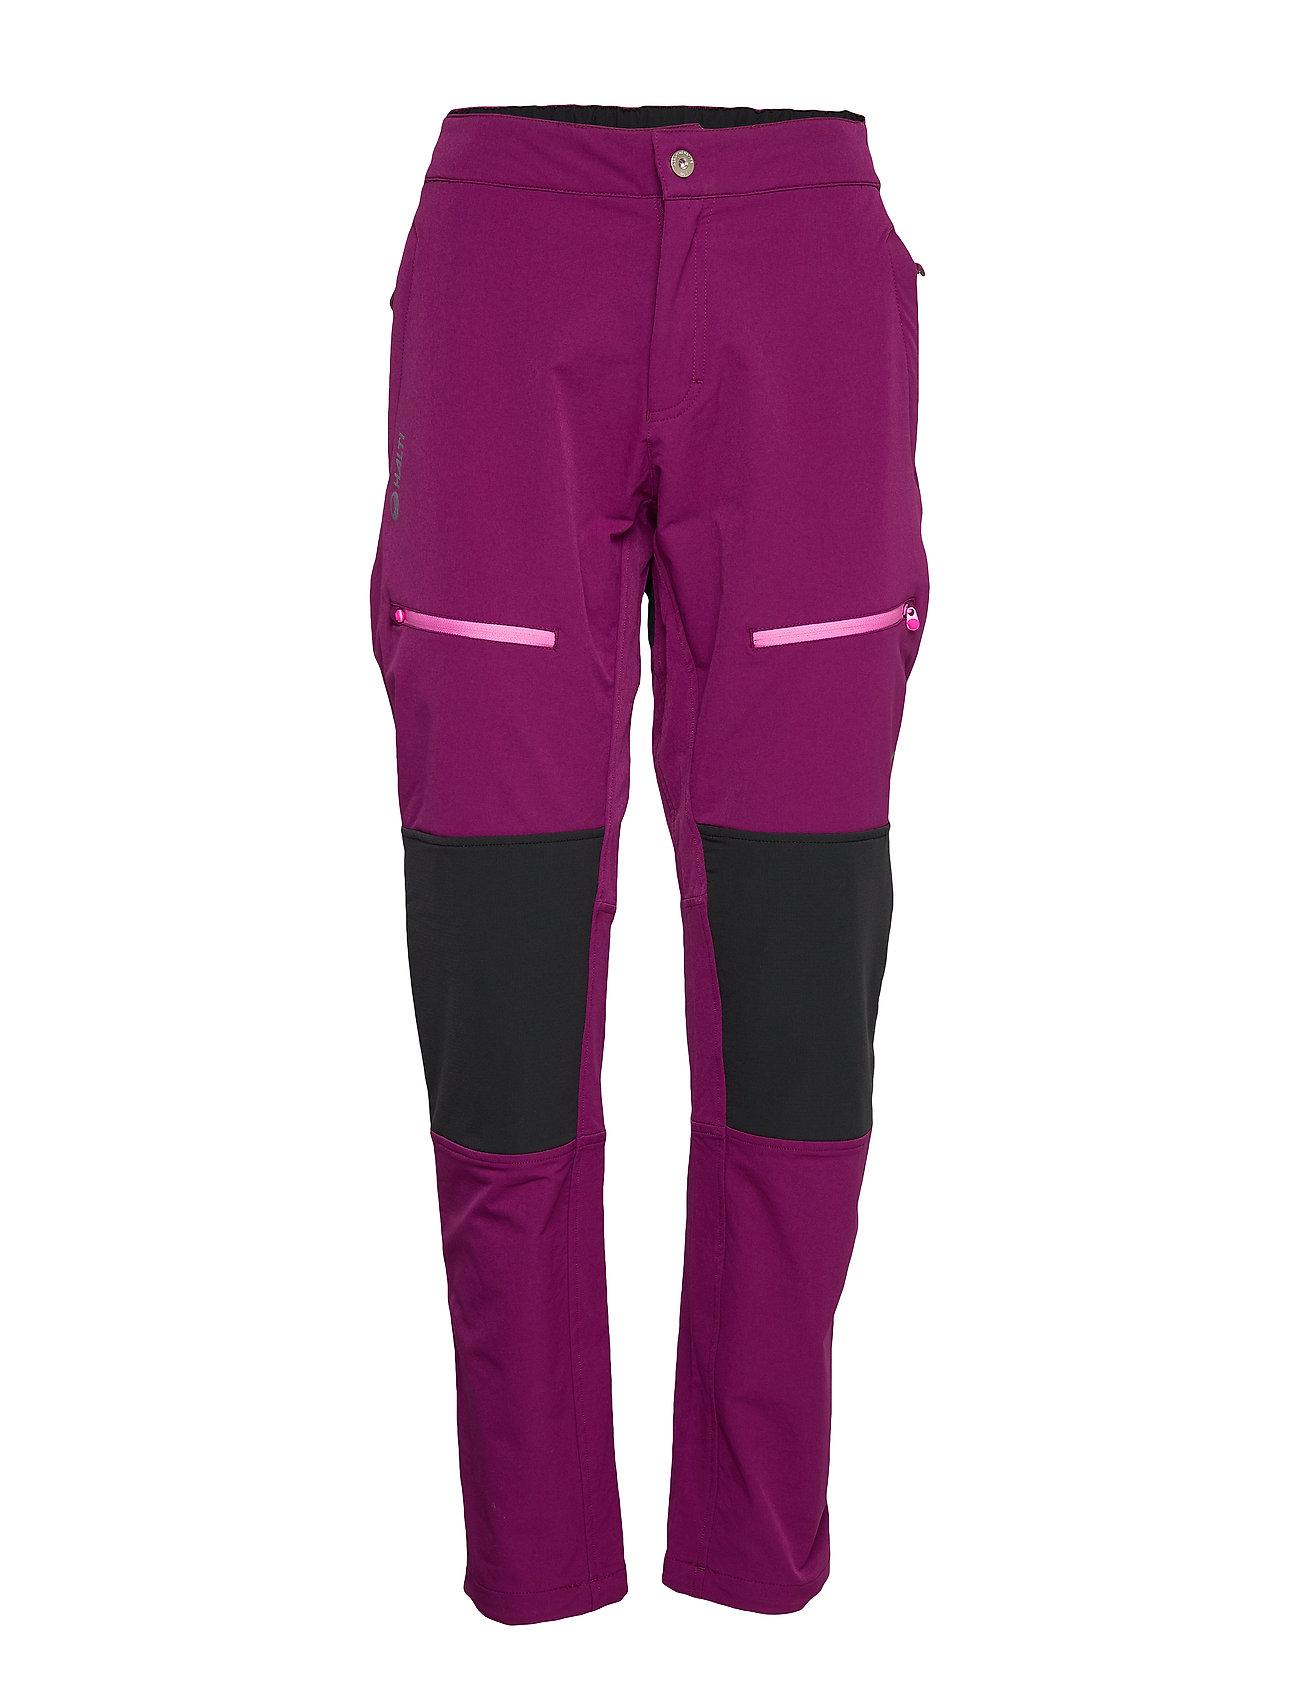 Halti Pallas W+ warm X-stretch pants - MAGENTA PURPLE